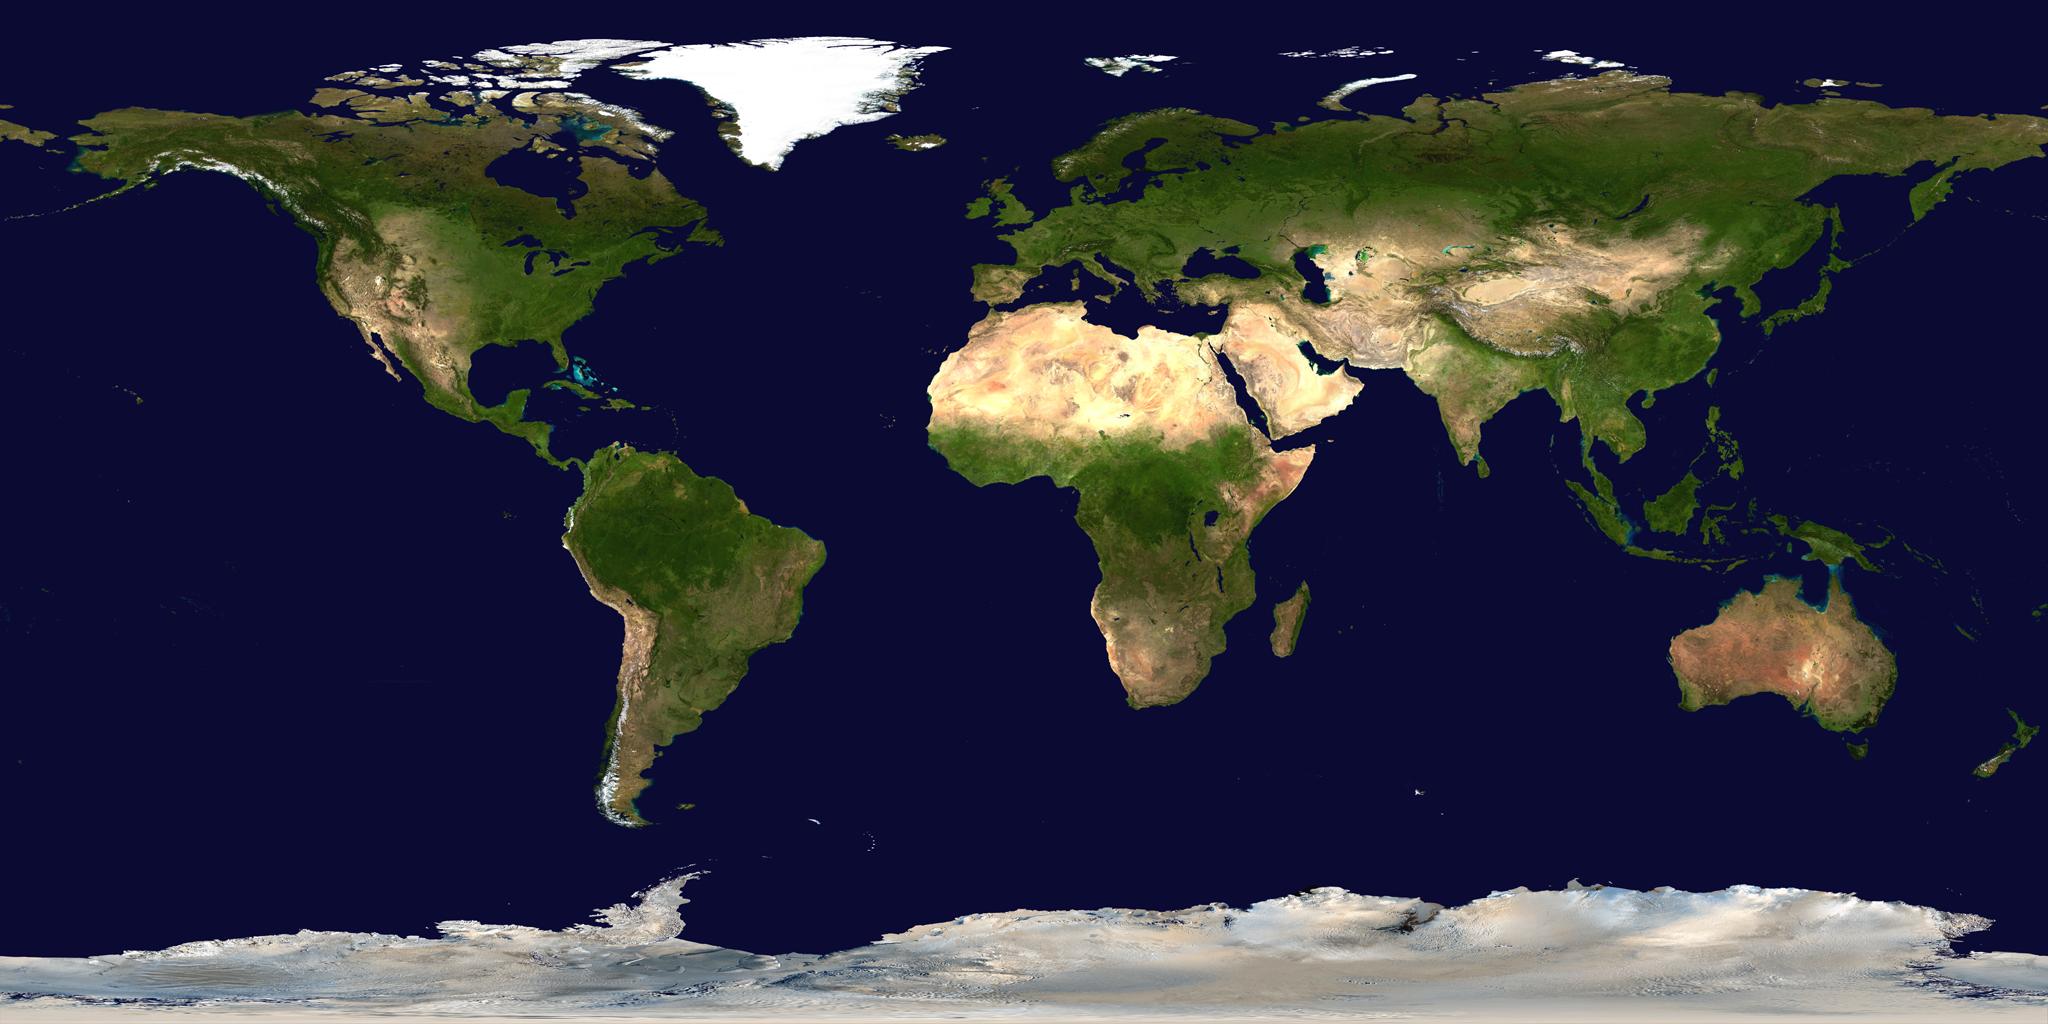 NASA Goddard Scientific Visualization Studio